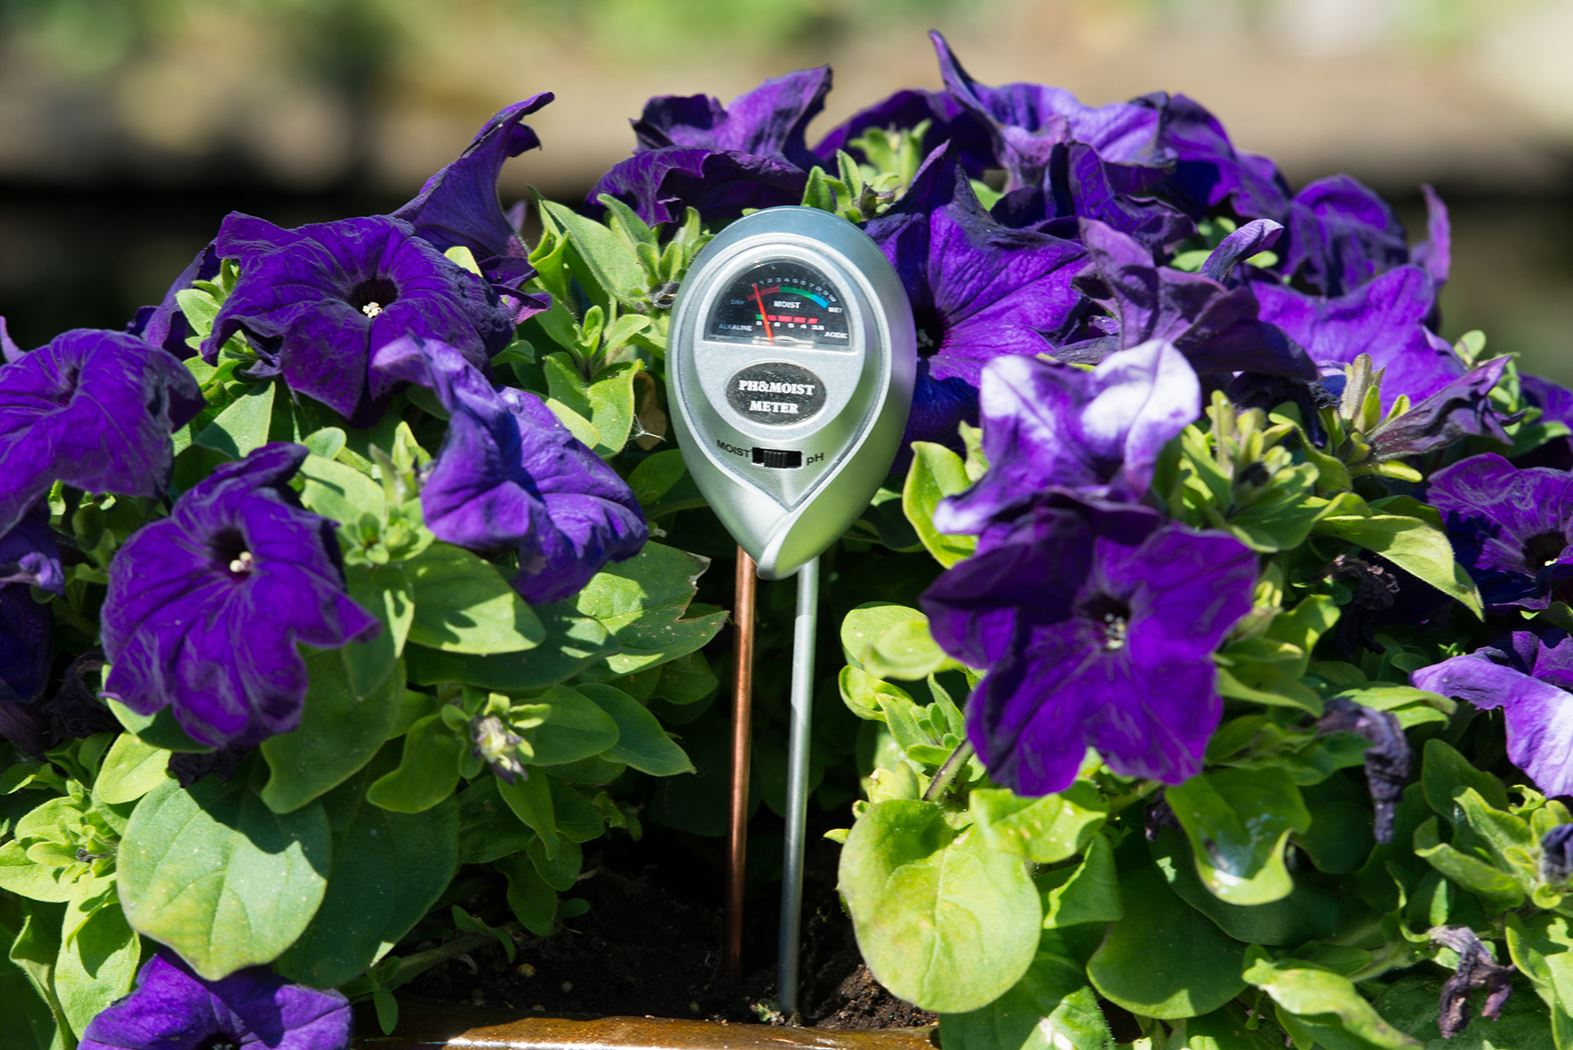 nature senso 3 - combi : ph-meter en vochtigheidsmeter